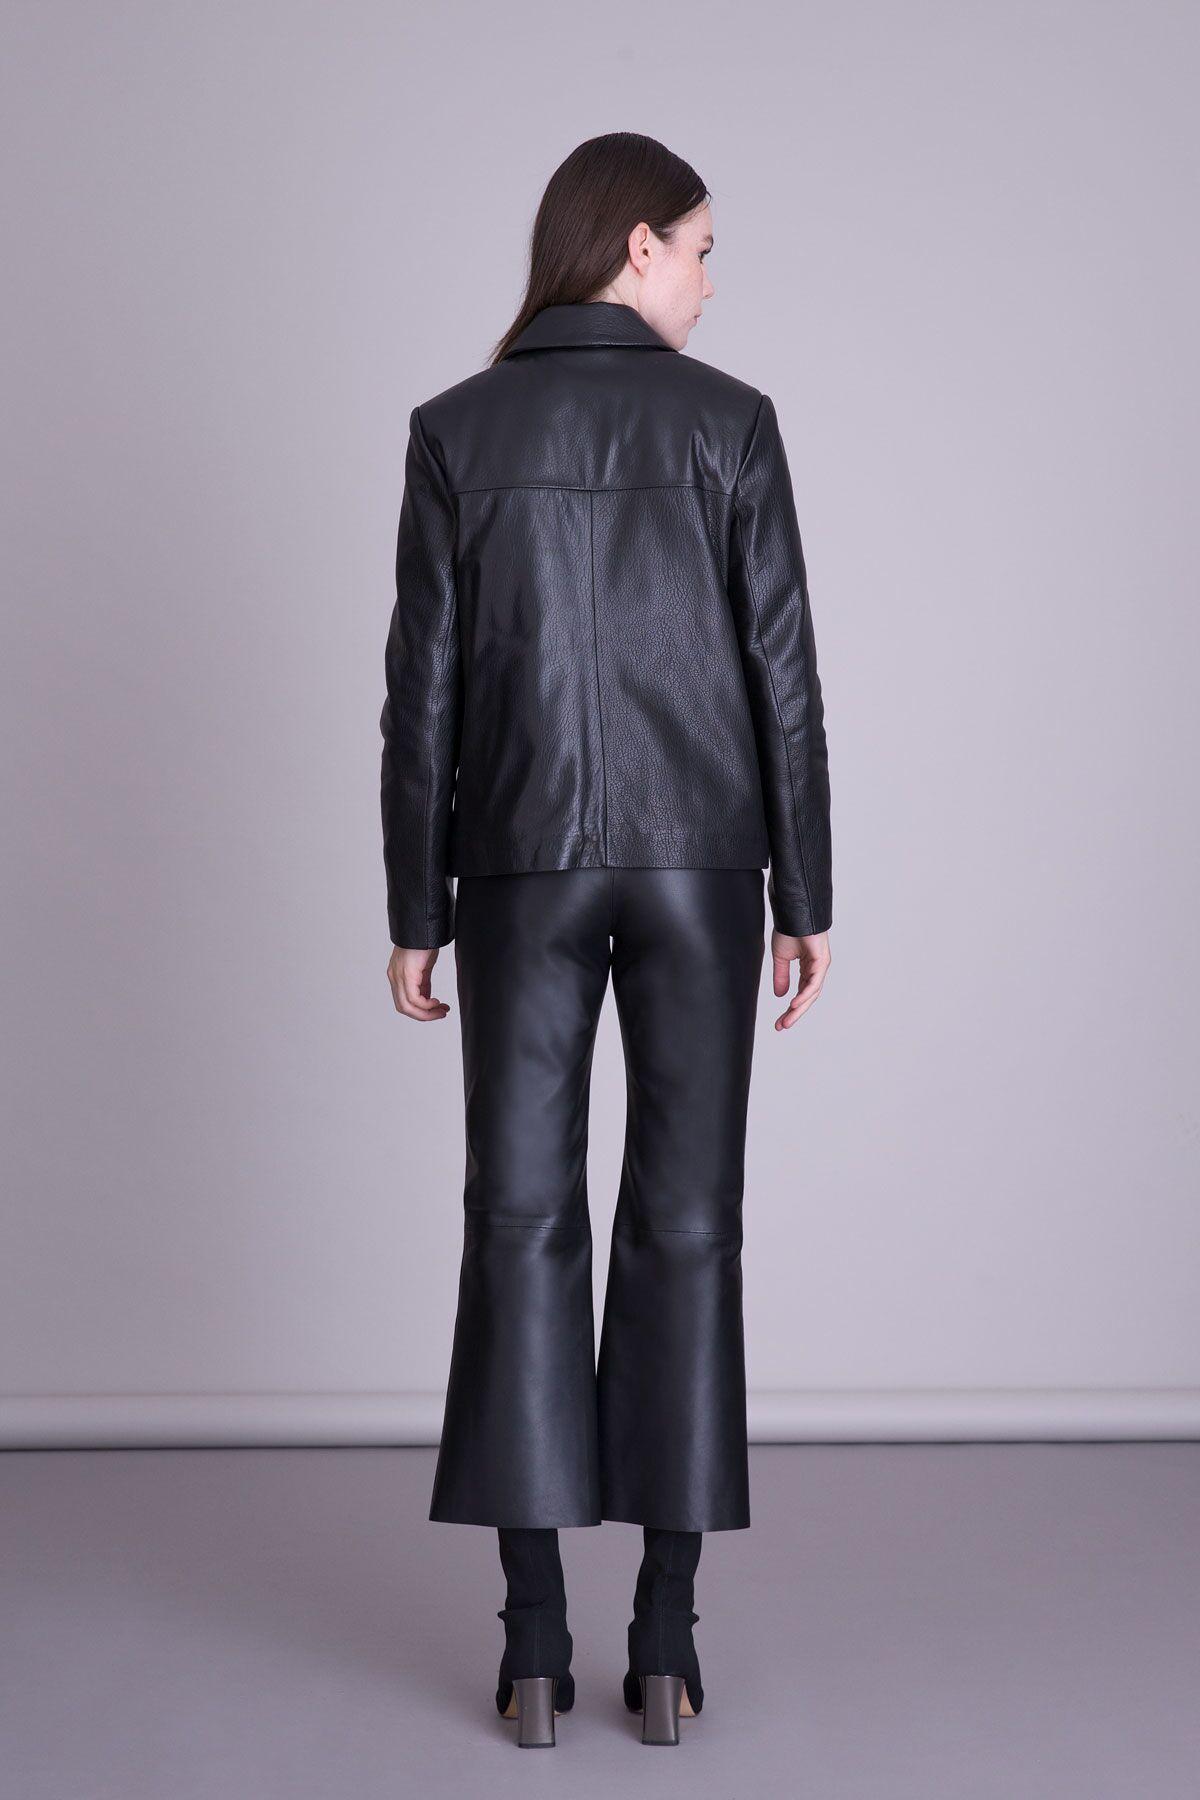 Fırfır Detaylı Siyah Deri Ceket